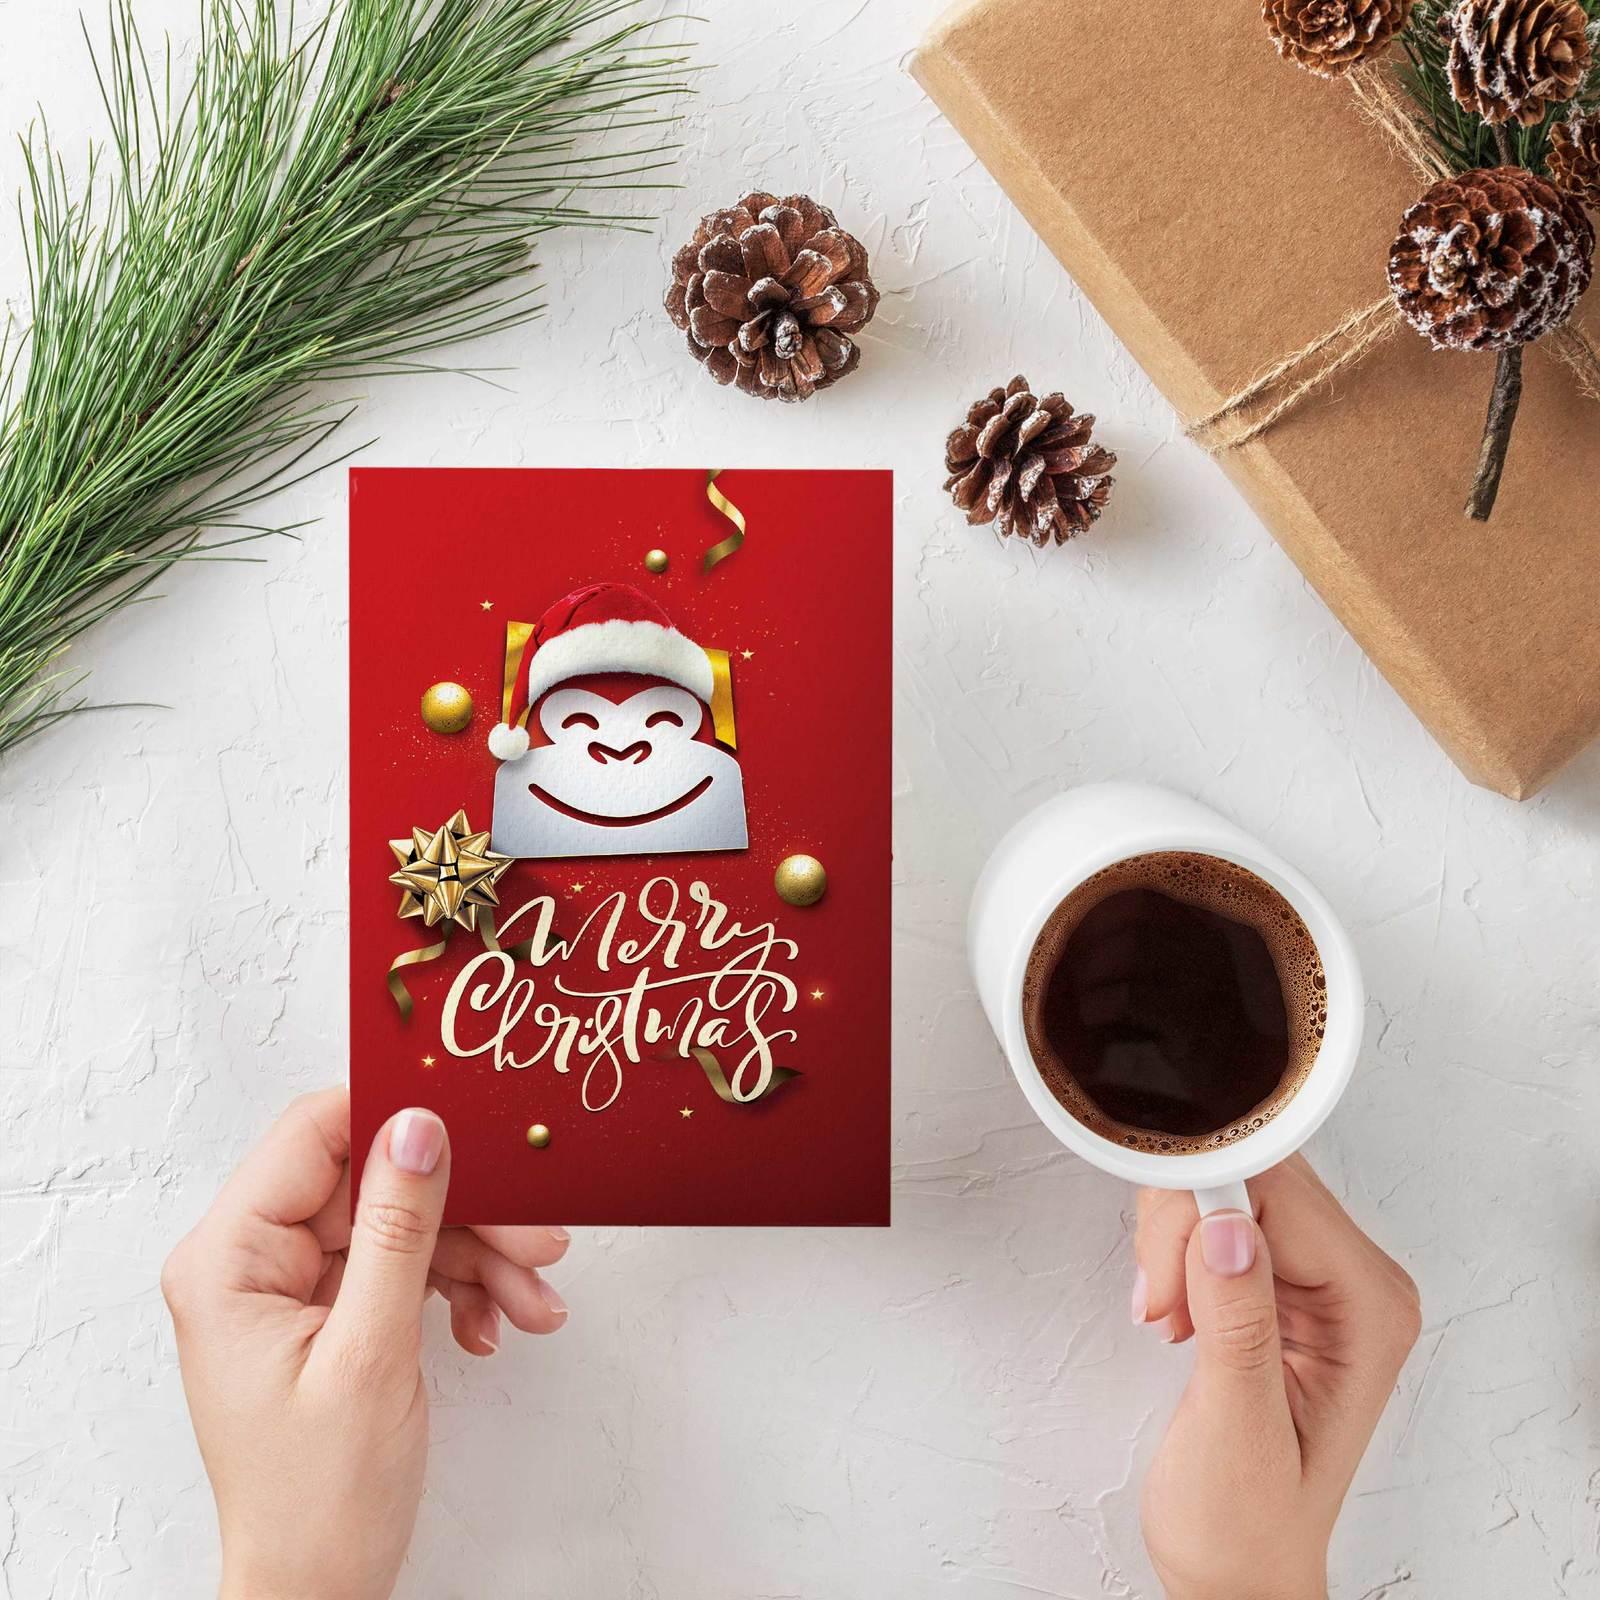 Gorilla Gift: Christmas Cards - Santa Hat (Pack of 10) image